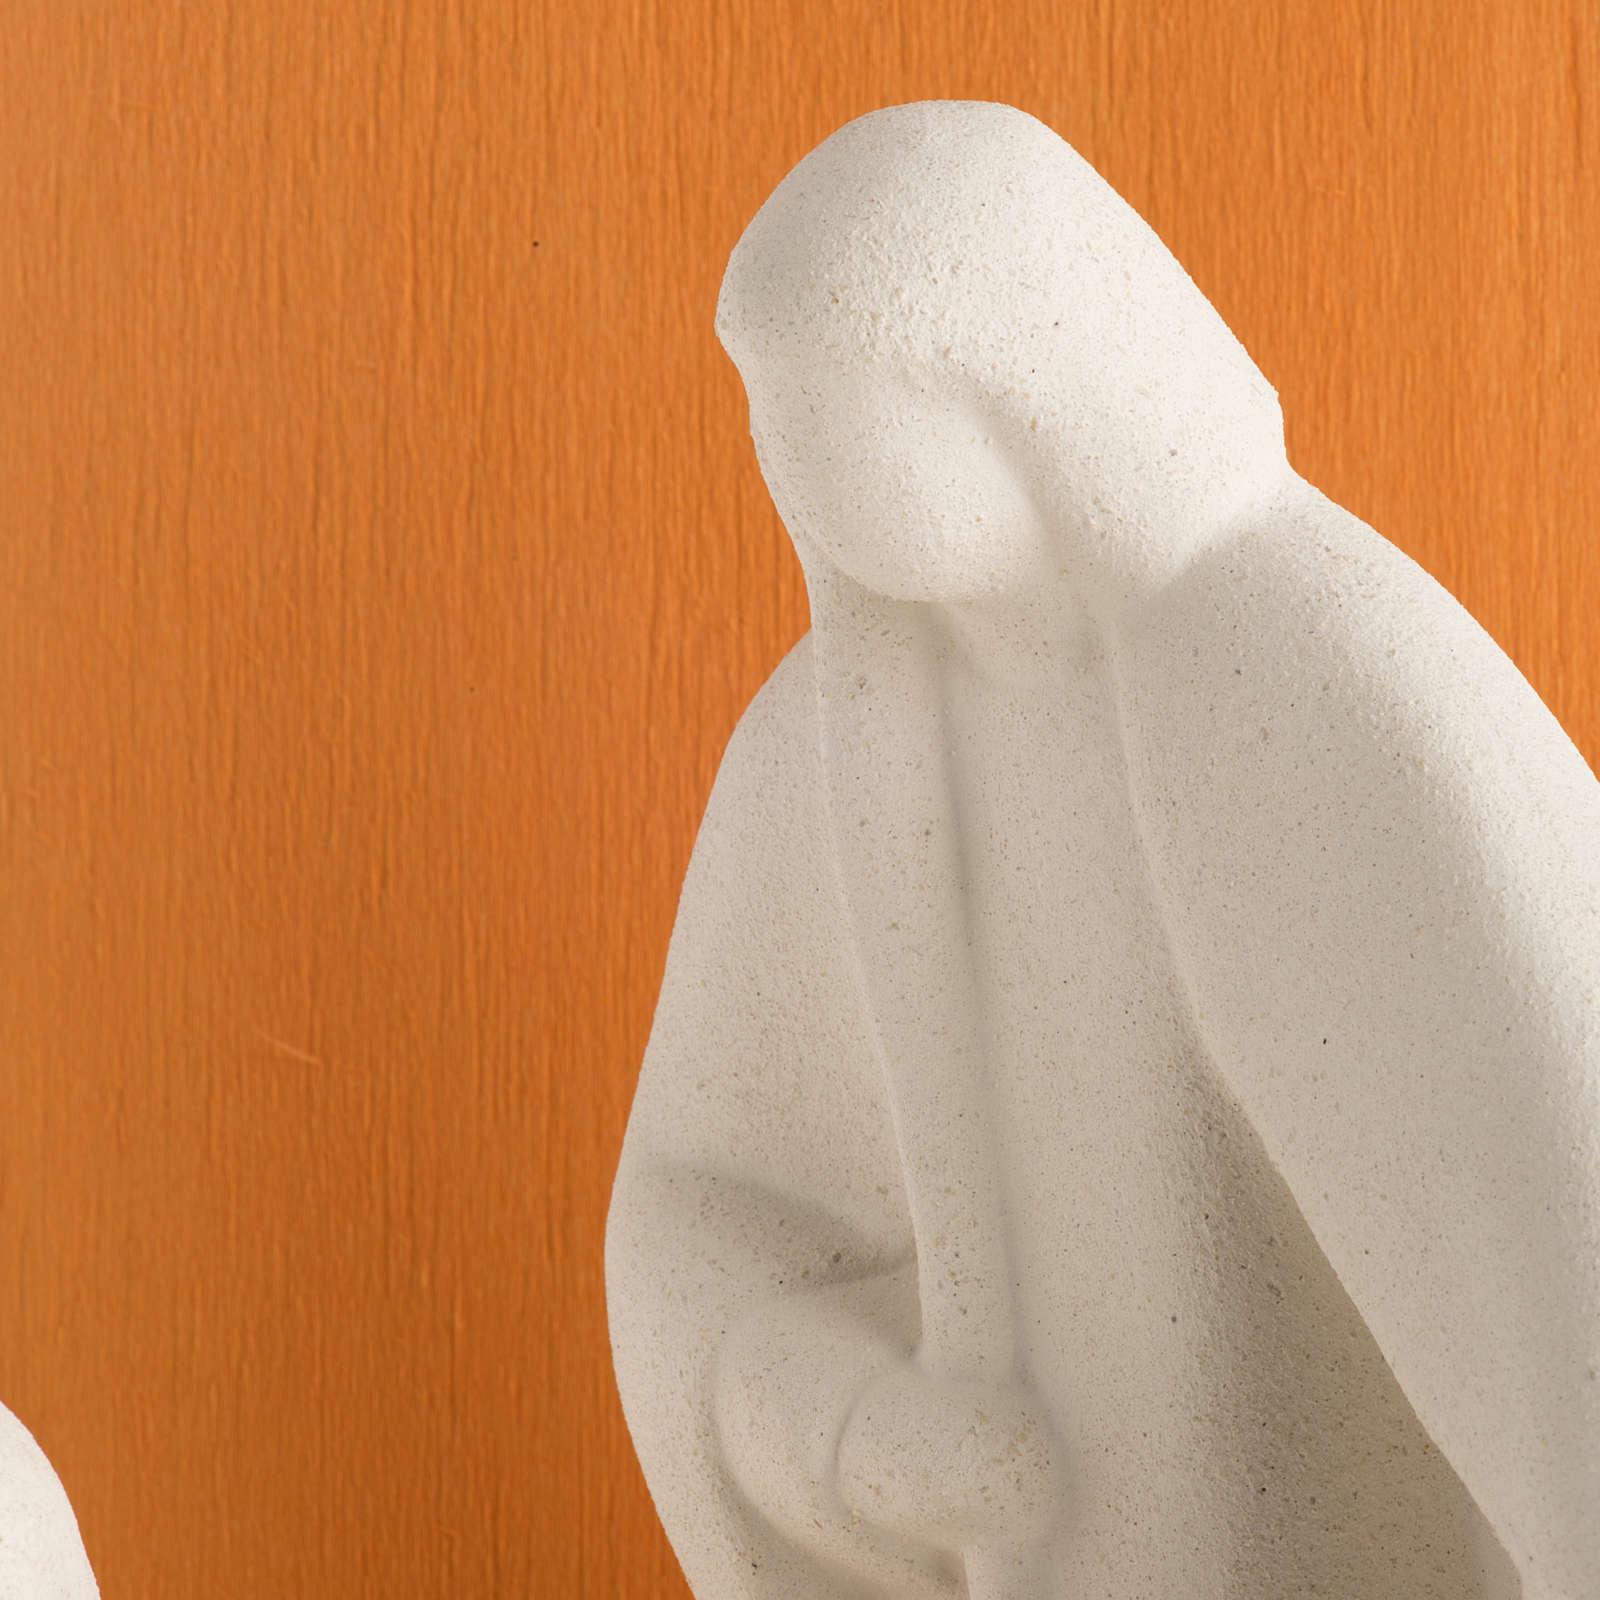 Nativity scene Noel model in white clay and orange natural wood, 4